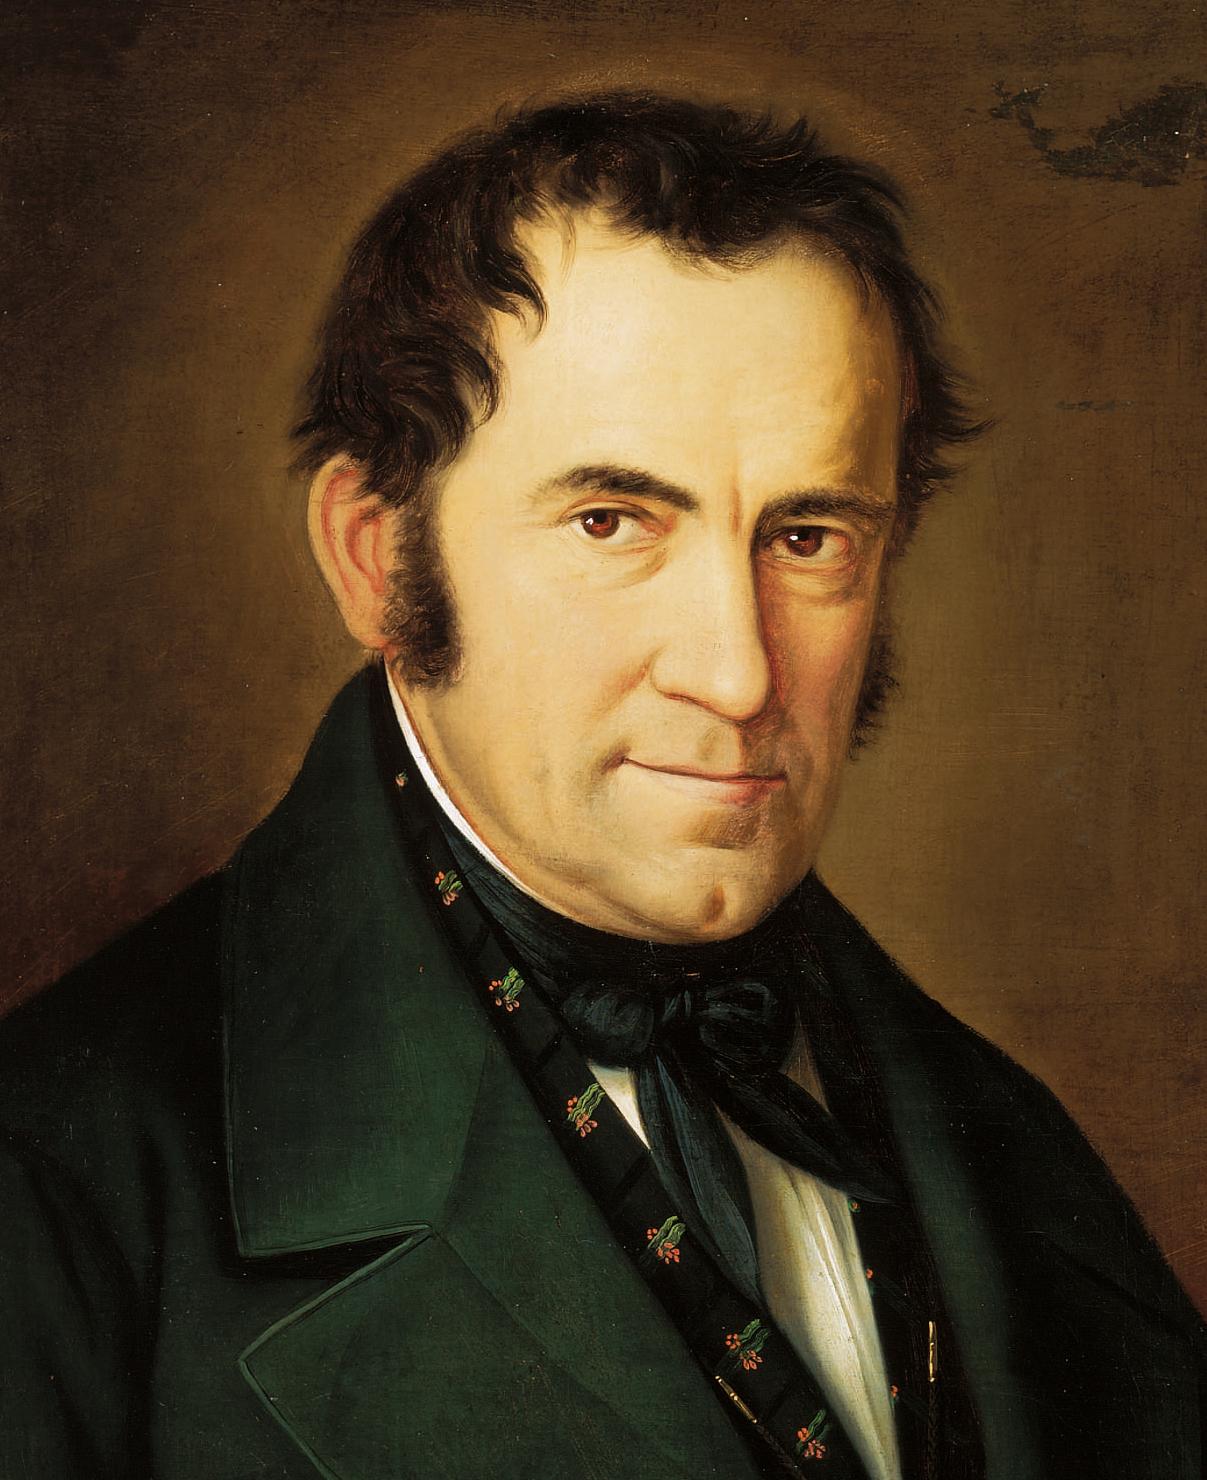 http://upload.wikimedia.org/wikipedia/commons/e/e4/Franz_Xaver_Gruber.jpg